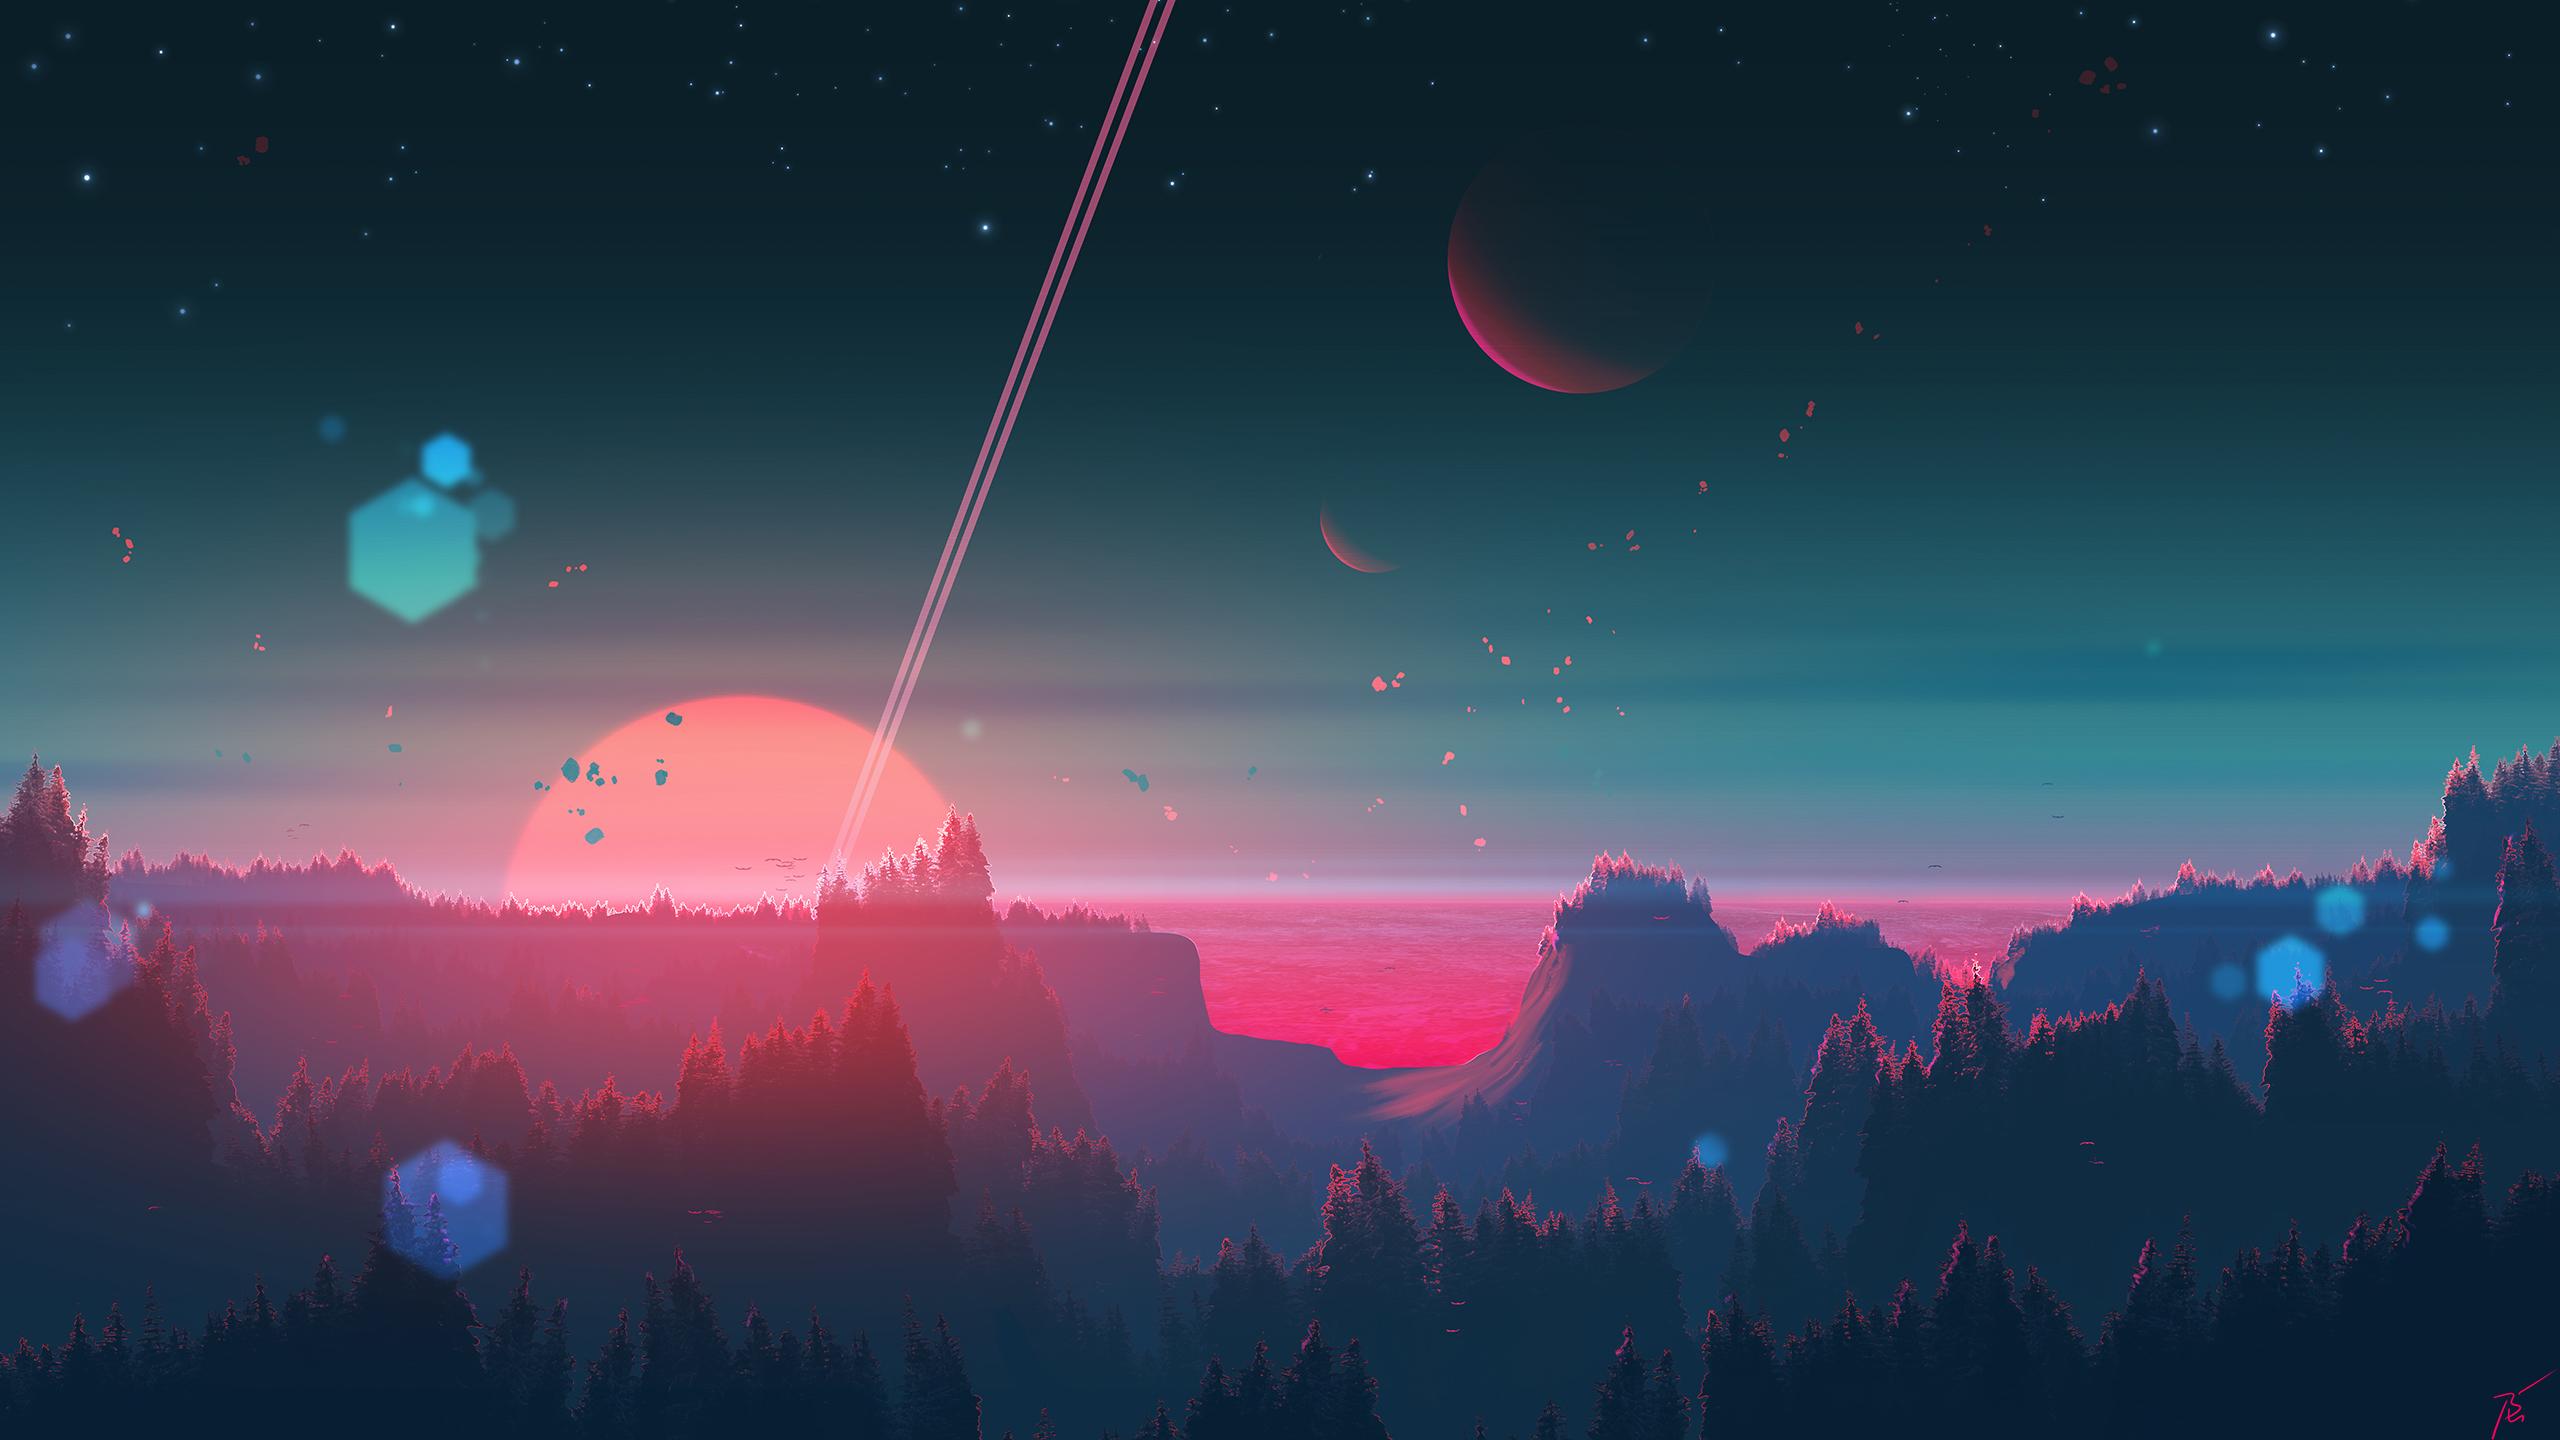 General 2560x1440 space art digital painting sky dystopian fantasy art landscape nature planet JoeyJazz